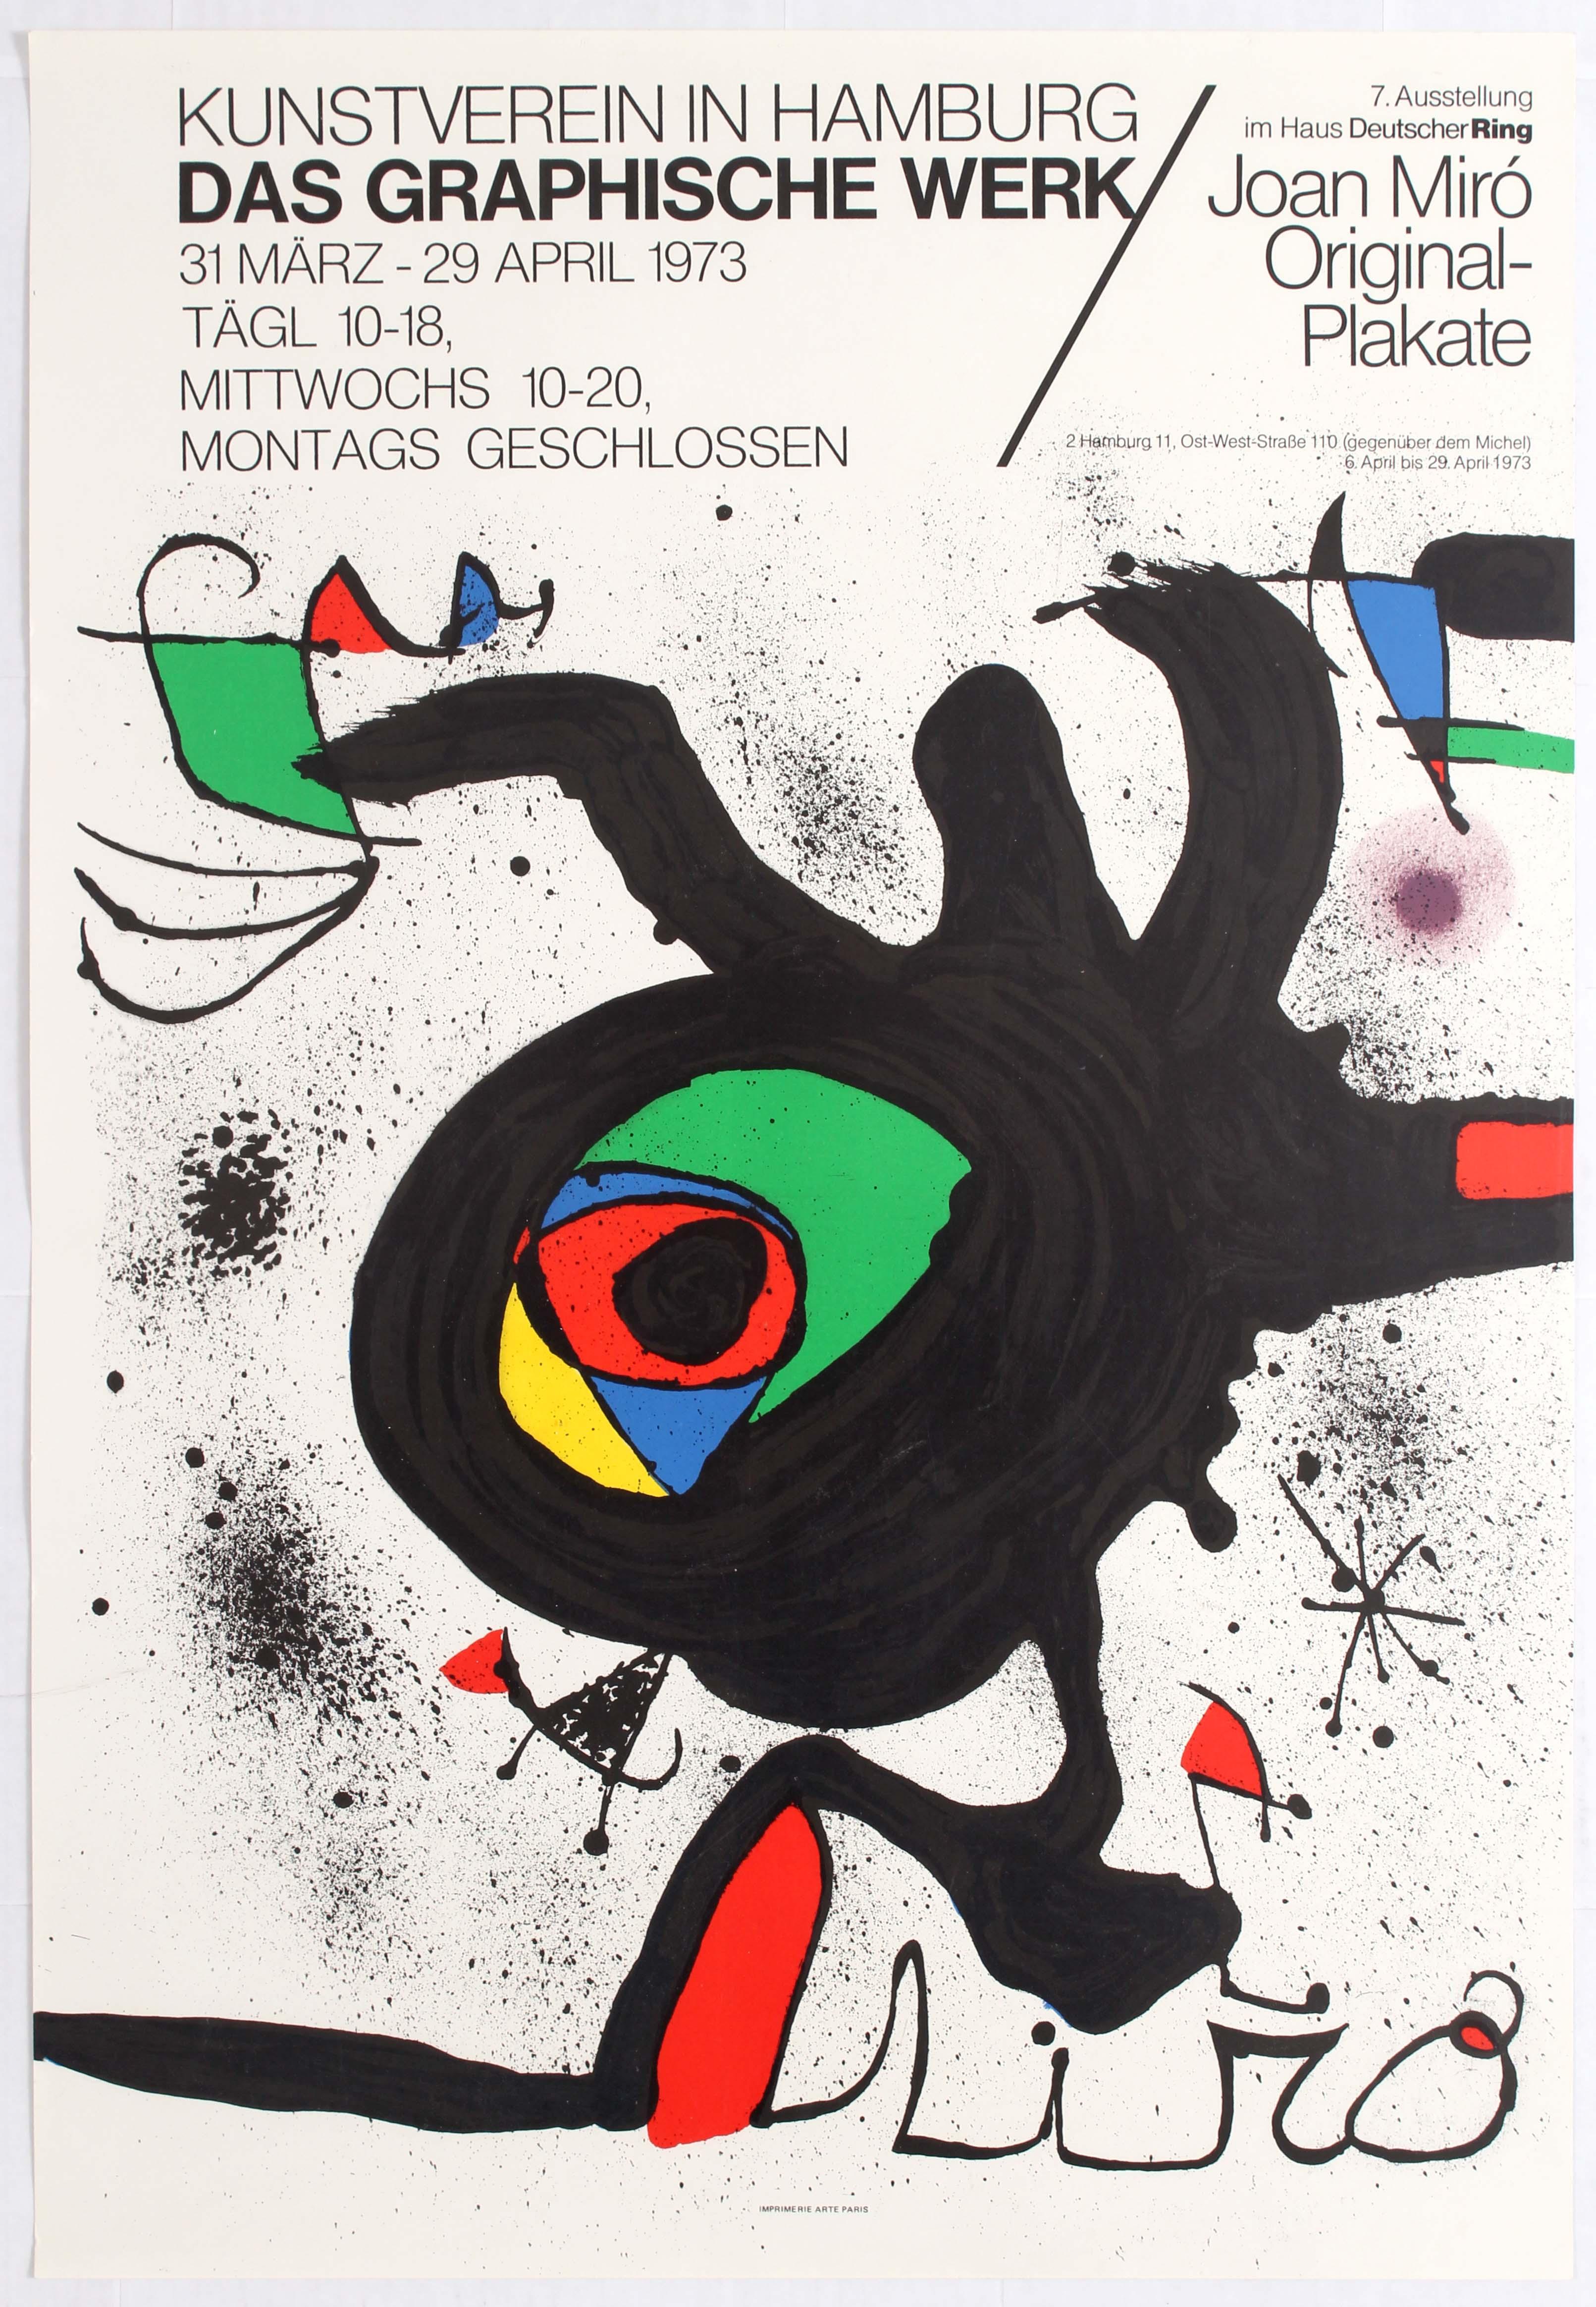 Exhibition Advertising Poster Miro Hamburg 1973